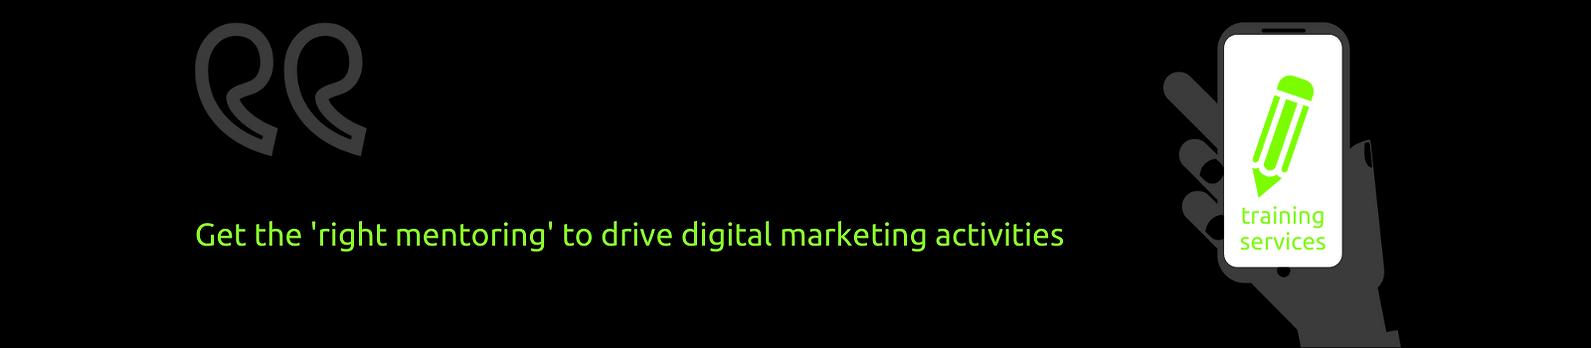 Digital Marketing Training.png